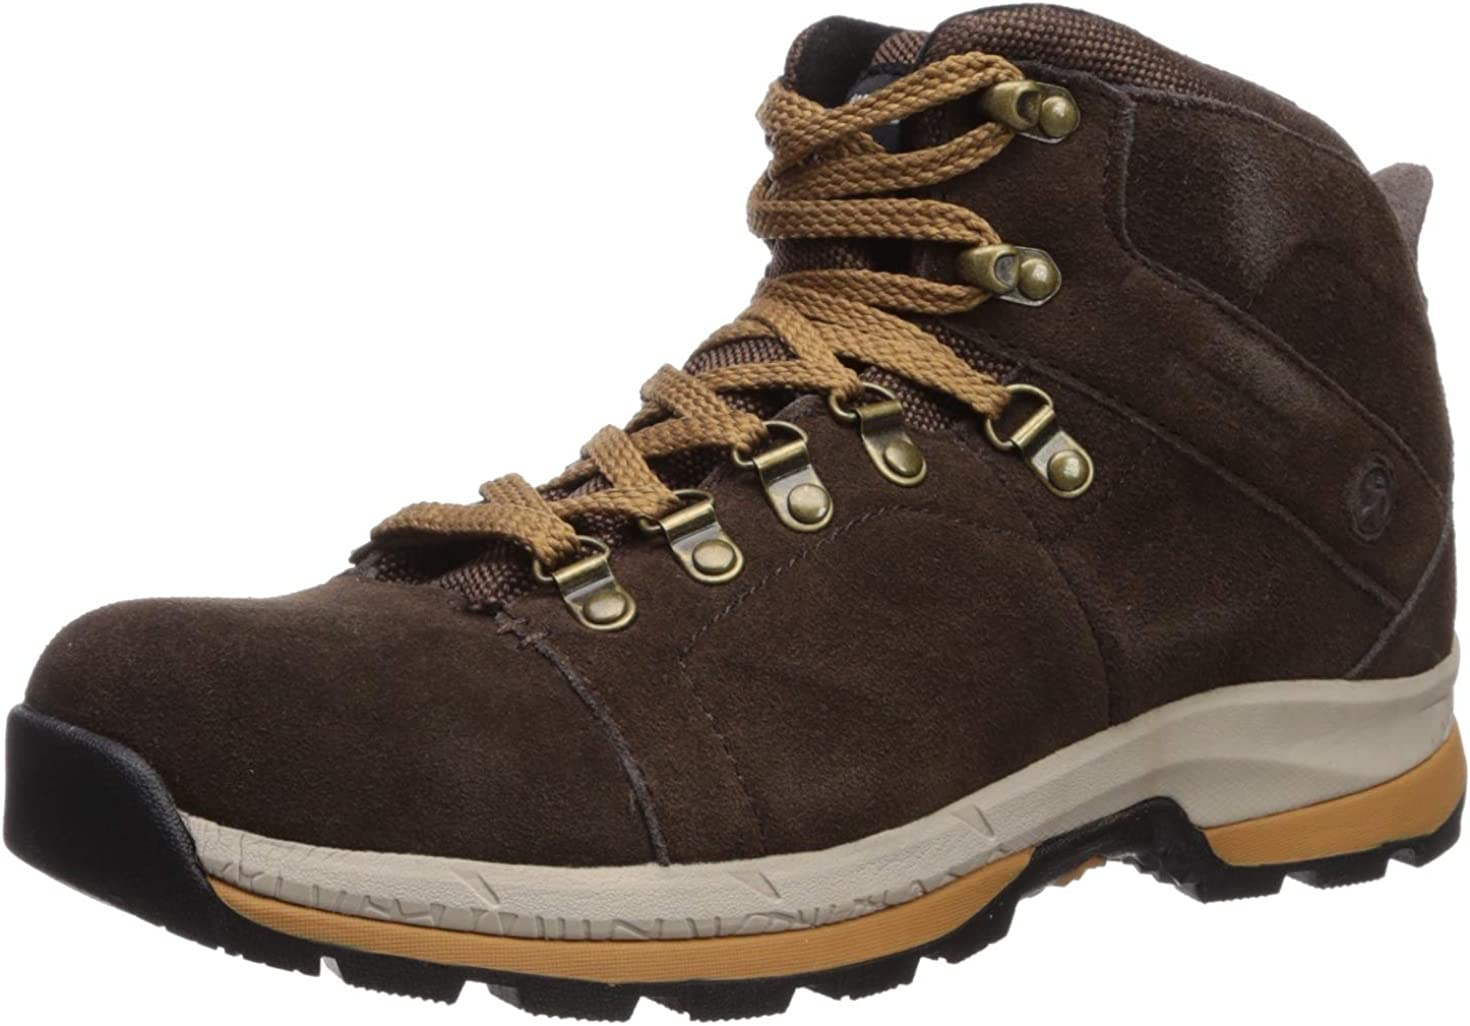 Northside Men's Denver Mall Genuine Free Shipping Larrabee Mid Boot Hiking Waterproof